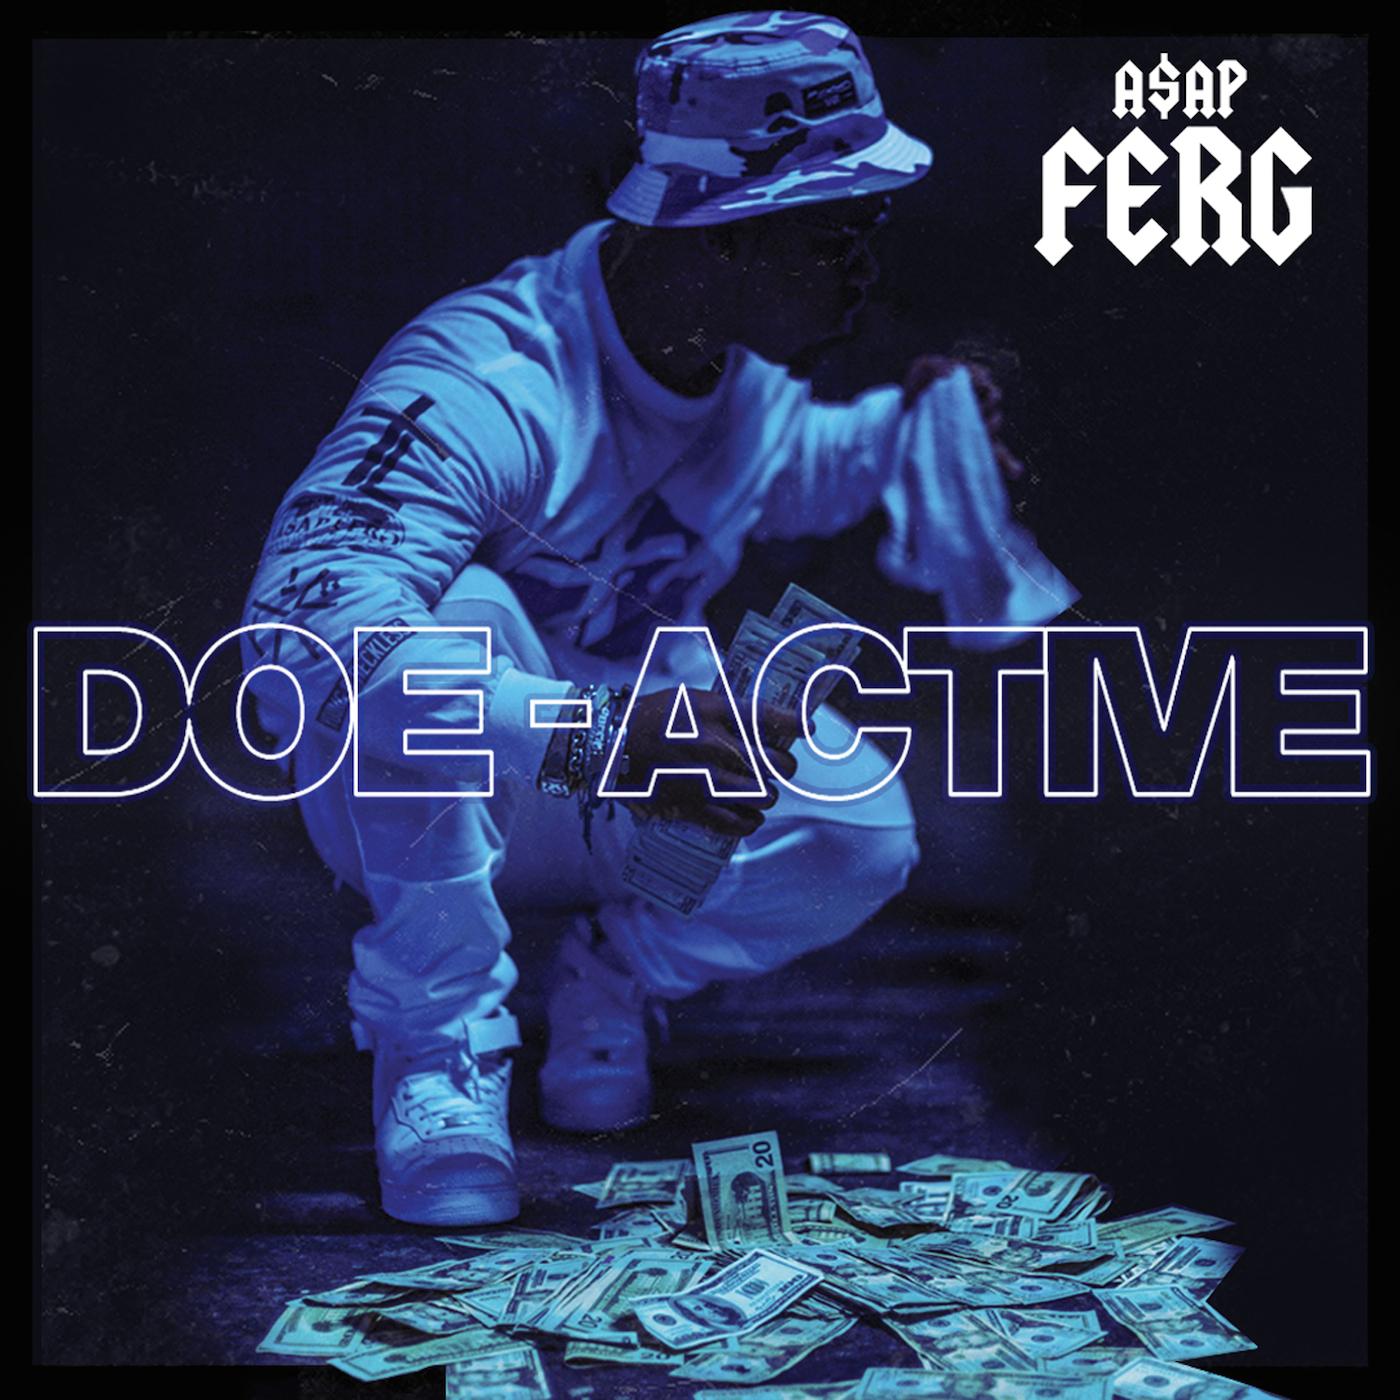 asap-ferg-doe-active.jpg